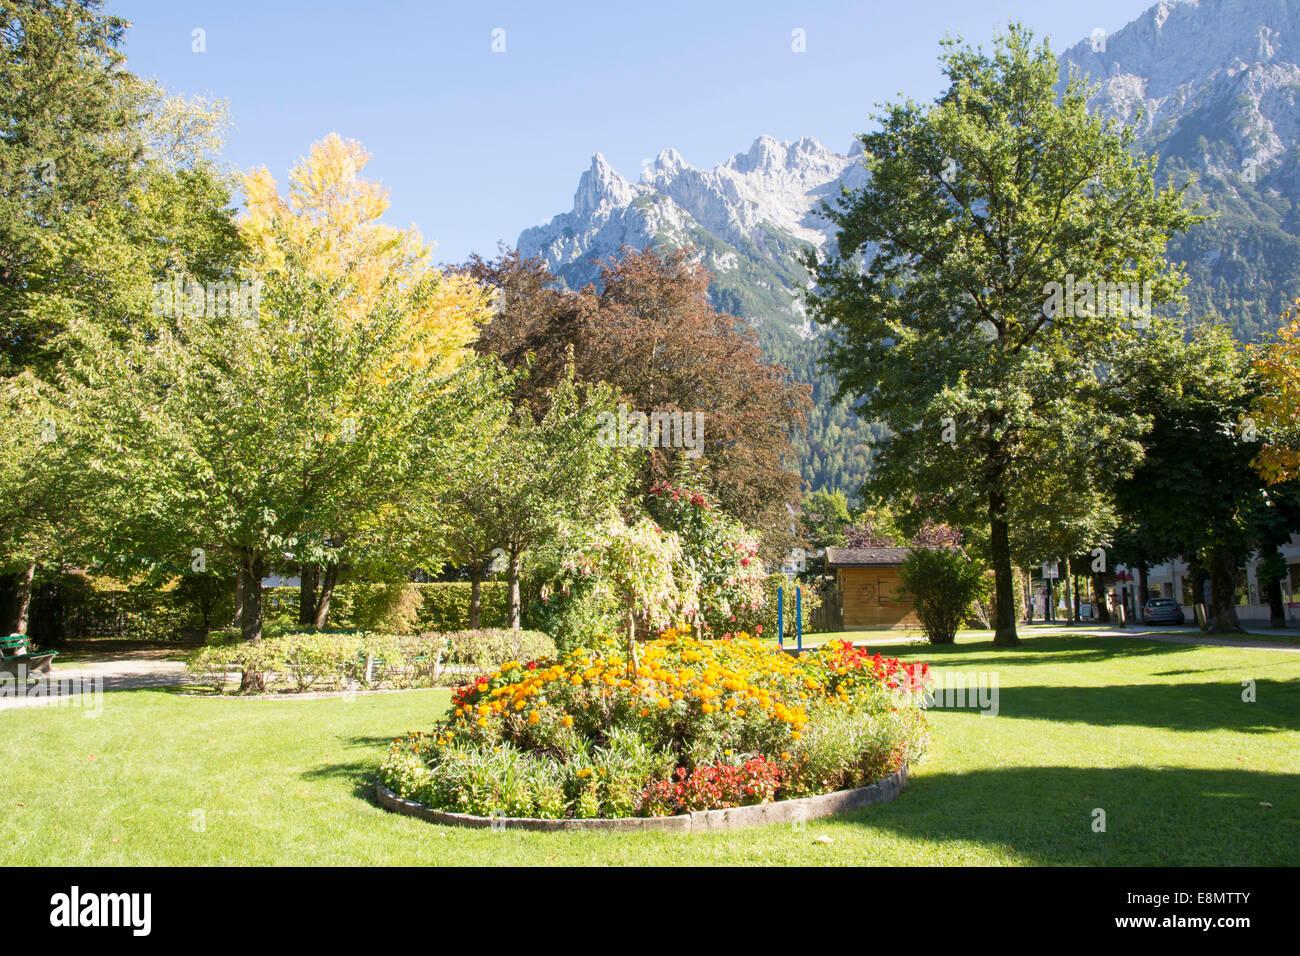 Park in Mittenwald at the Karwendel Mountains - Stock Image